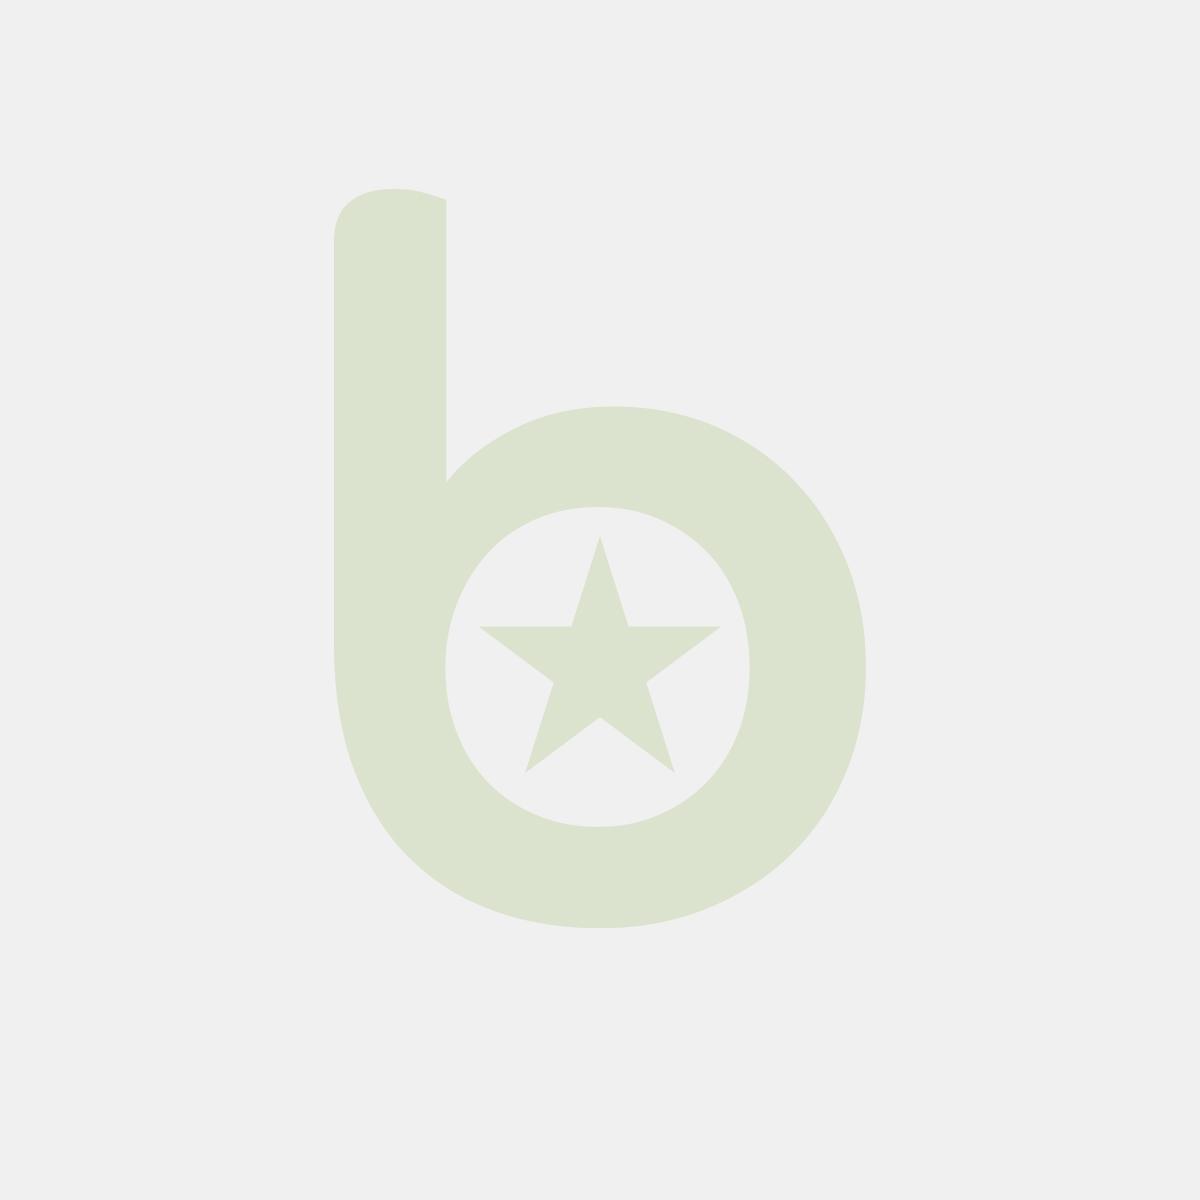 Kubek PAP/PE DW 300ml naturalny op.25szt (k/20) śr.90mm, ECO GRASS